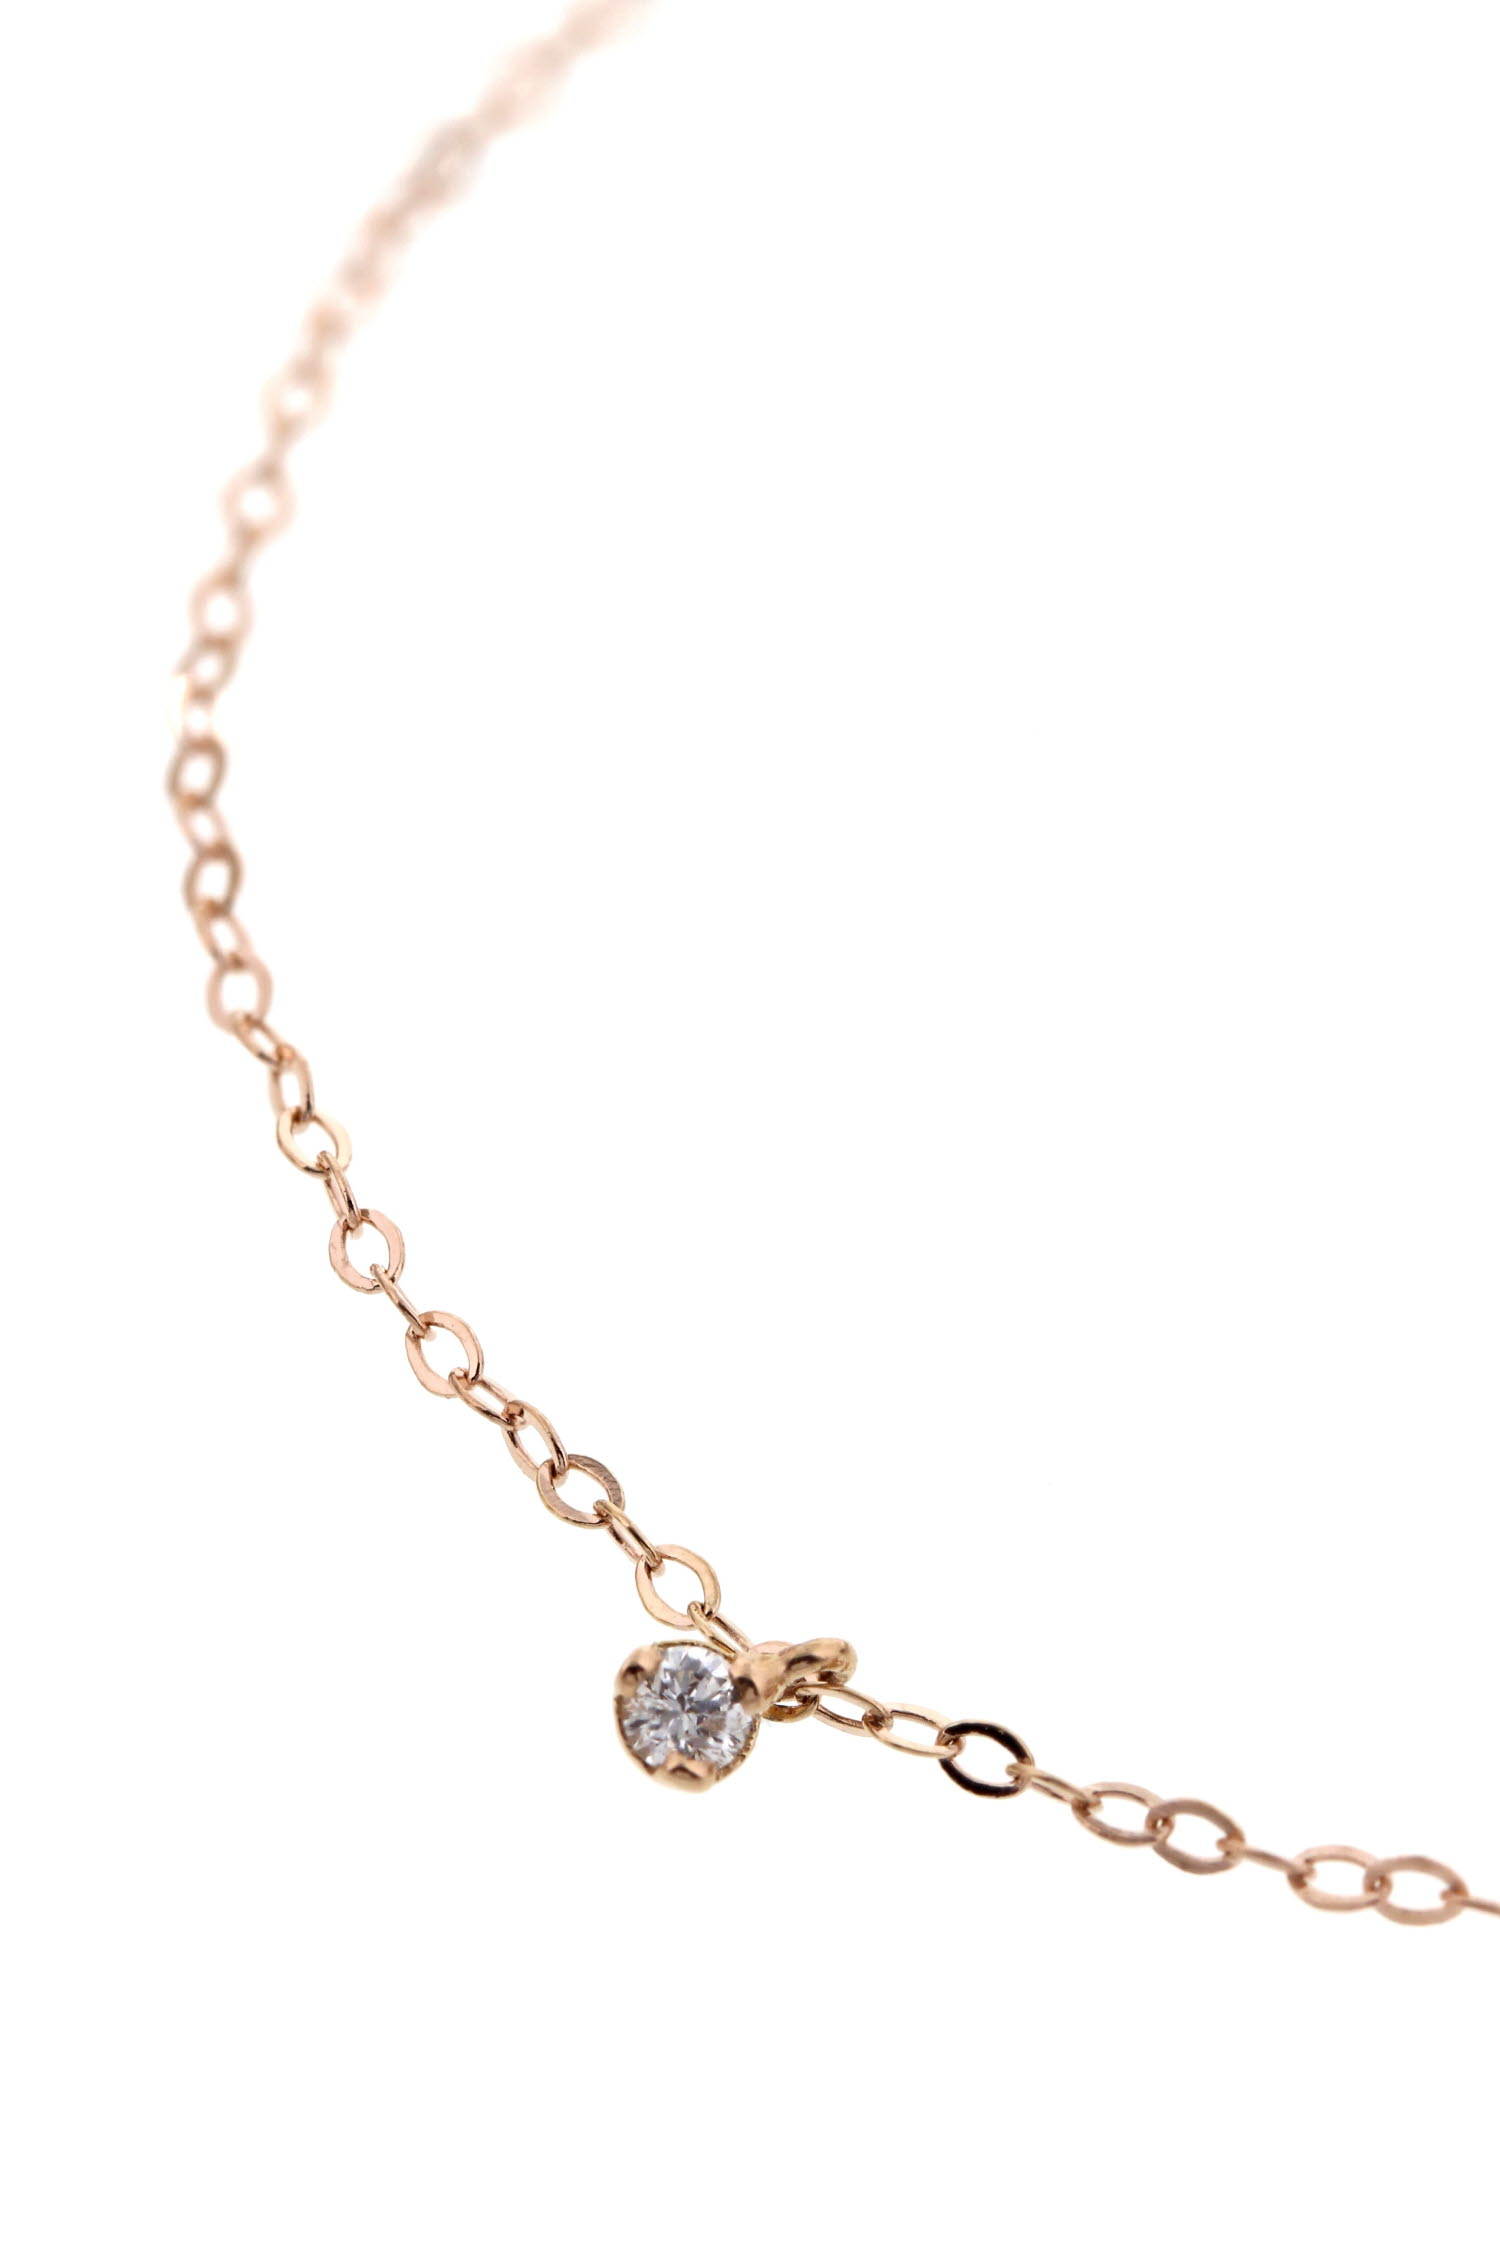 collier en or rose et diamant 42 cm gigi clozeau. Black Bedroom Furniture Sets. Home Design Ideas